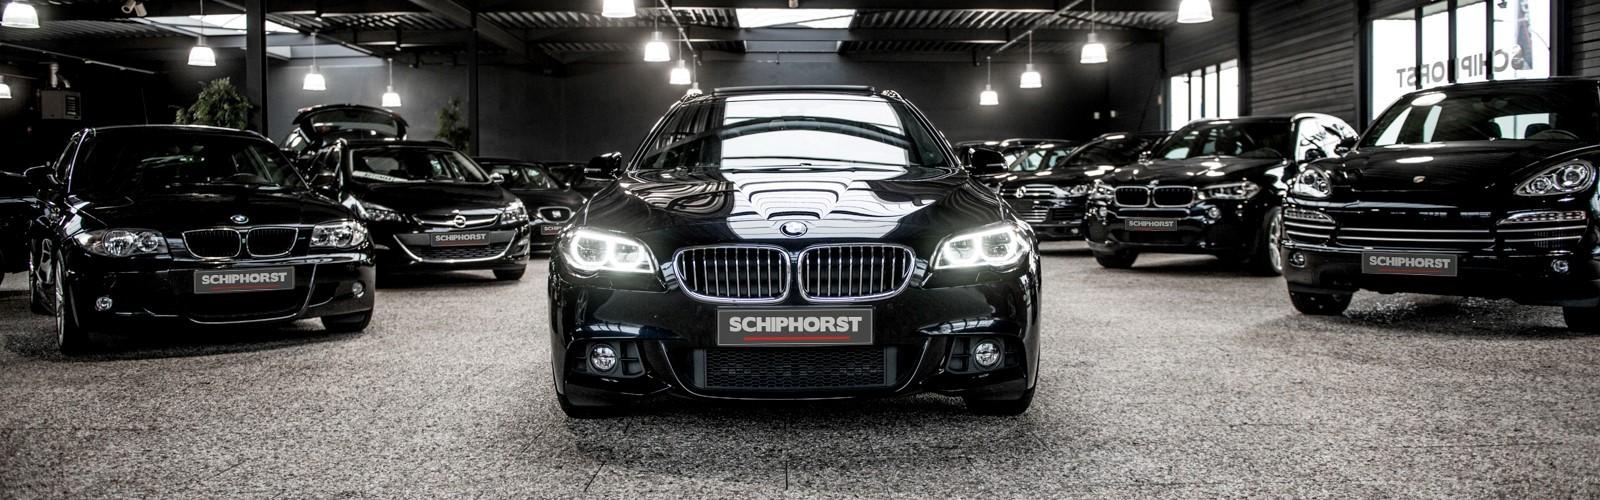 Autobedrijf Schiphorst